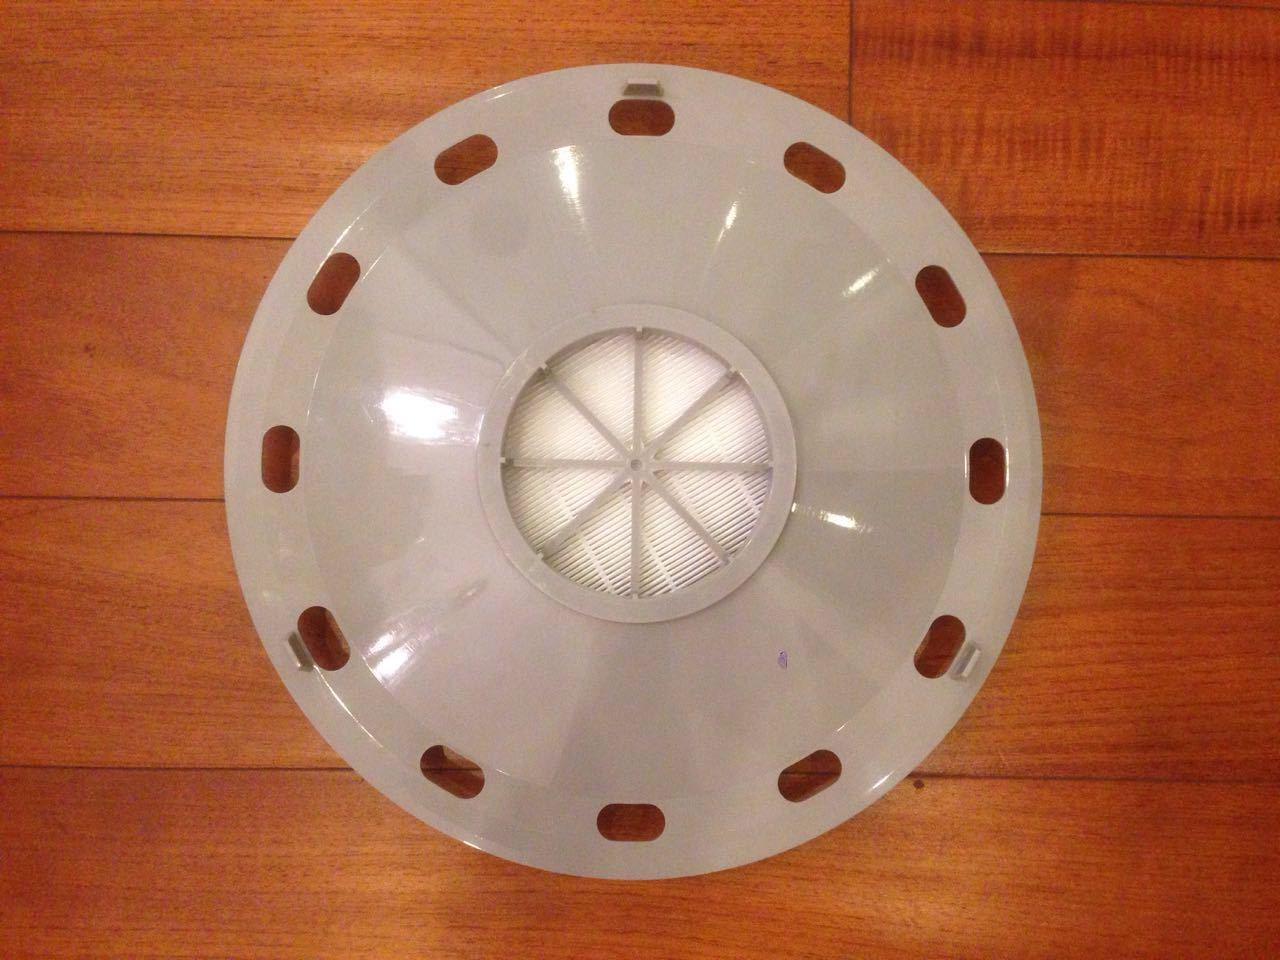 HEPA filter fits Pullman Holt PV930 Euroclean GD930 Nilfisk GD930--Free shipping